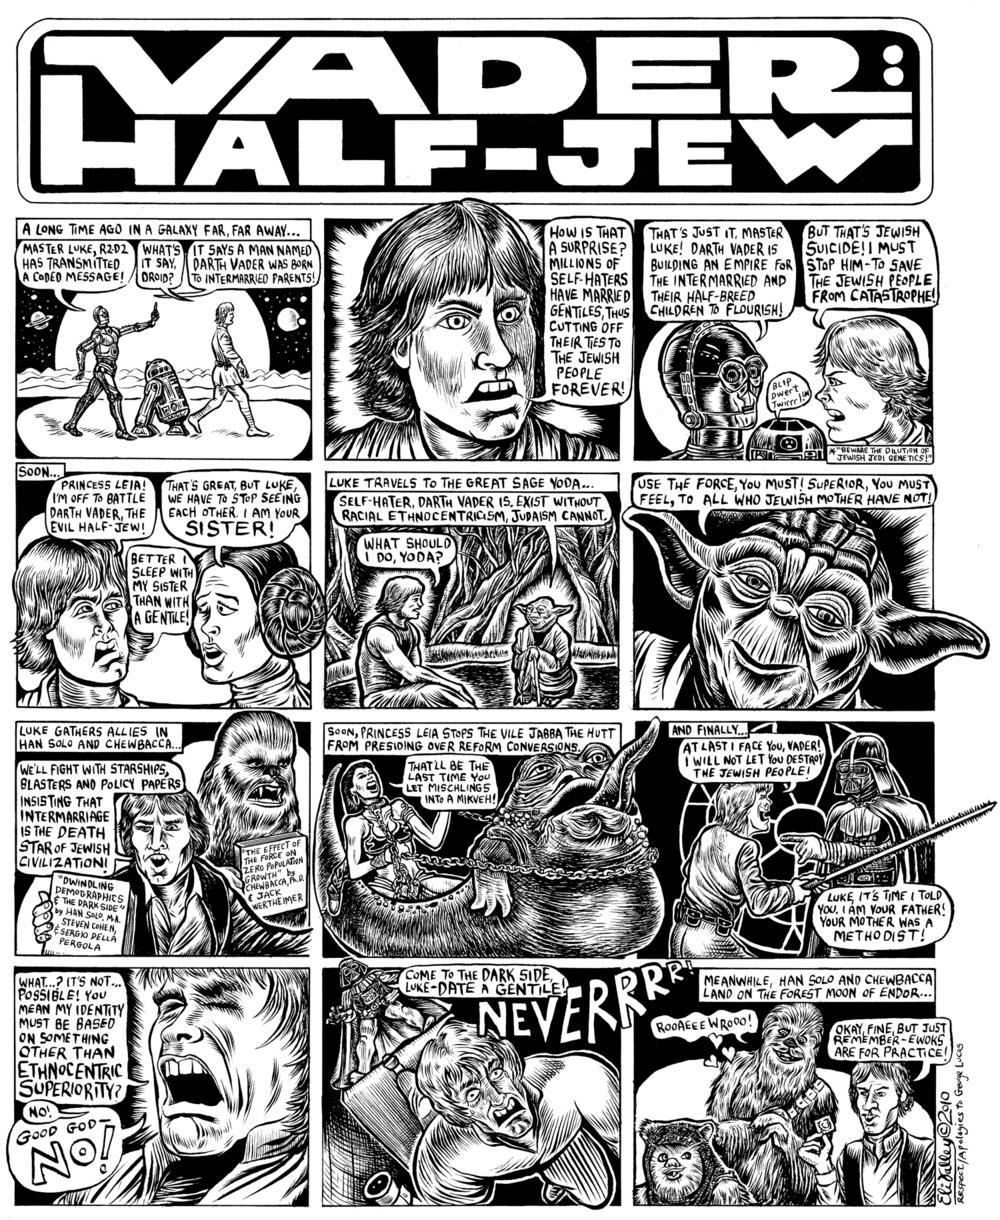 Vader: Half-Jew: Intermarriage. Forward, 3/25/10